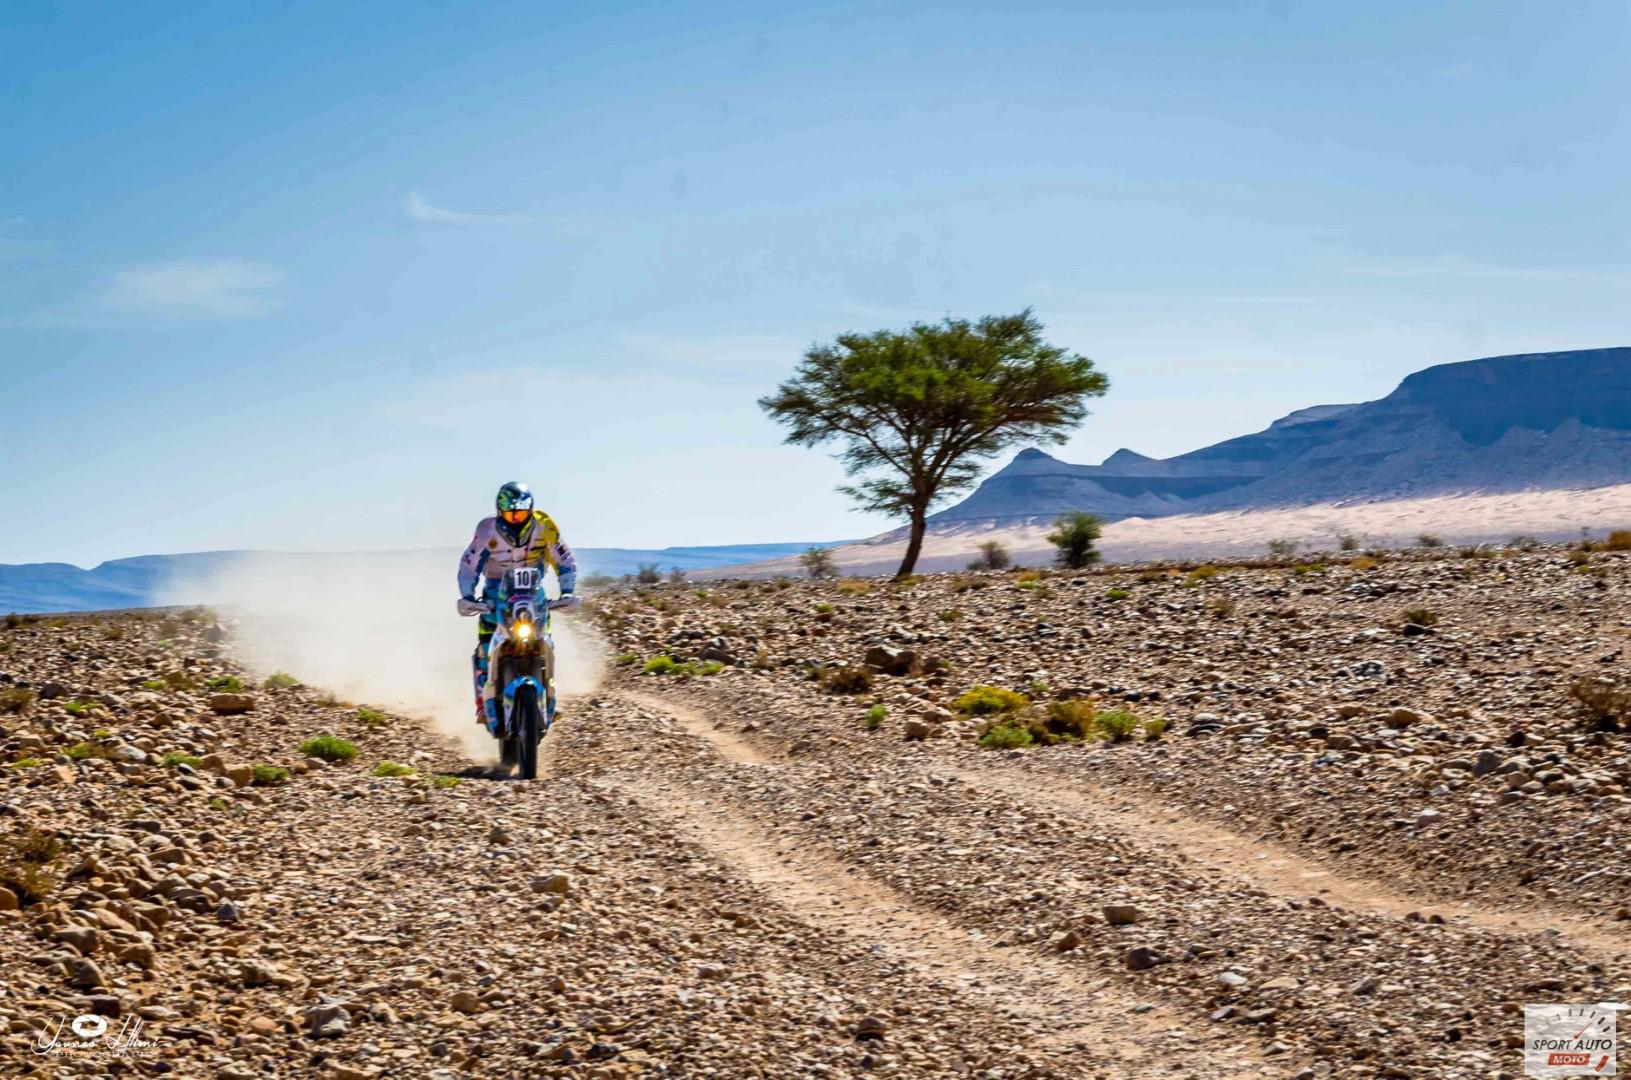 rallye-hearts-of-morrocco-2017-lionel-baud-vainqueur-du-jour-444-4.jpg